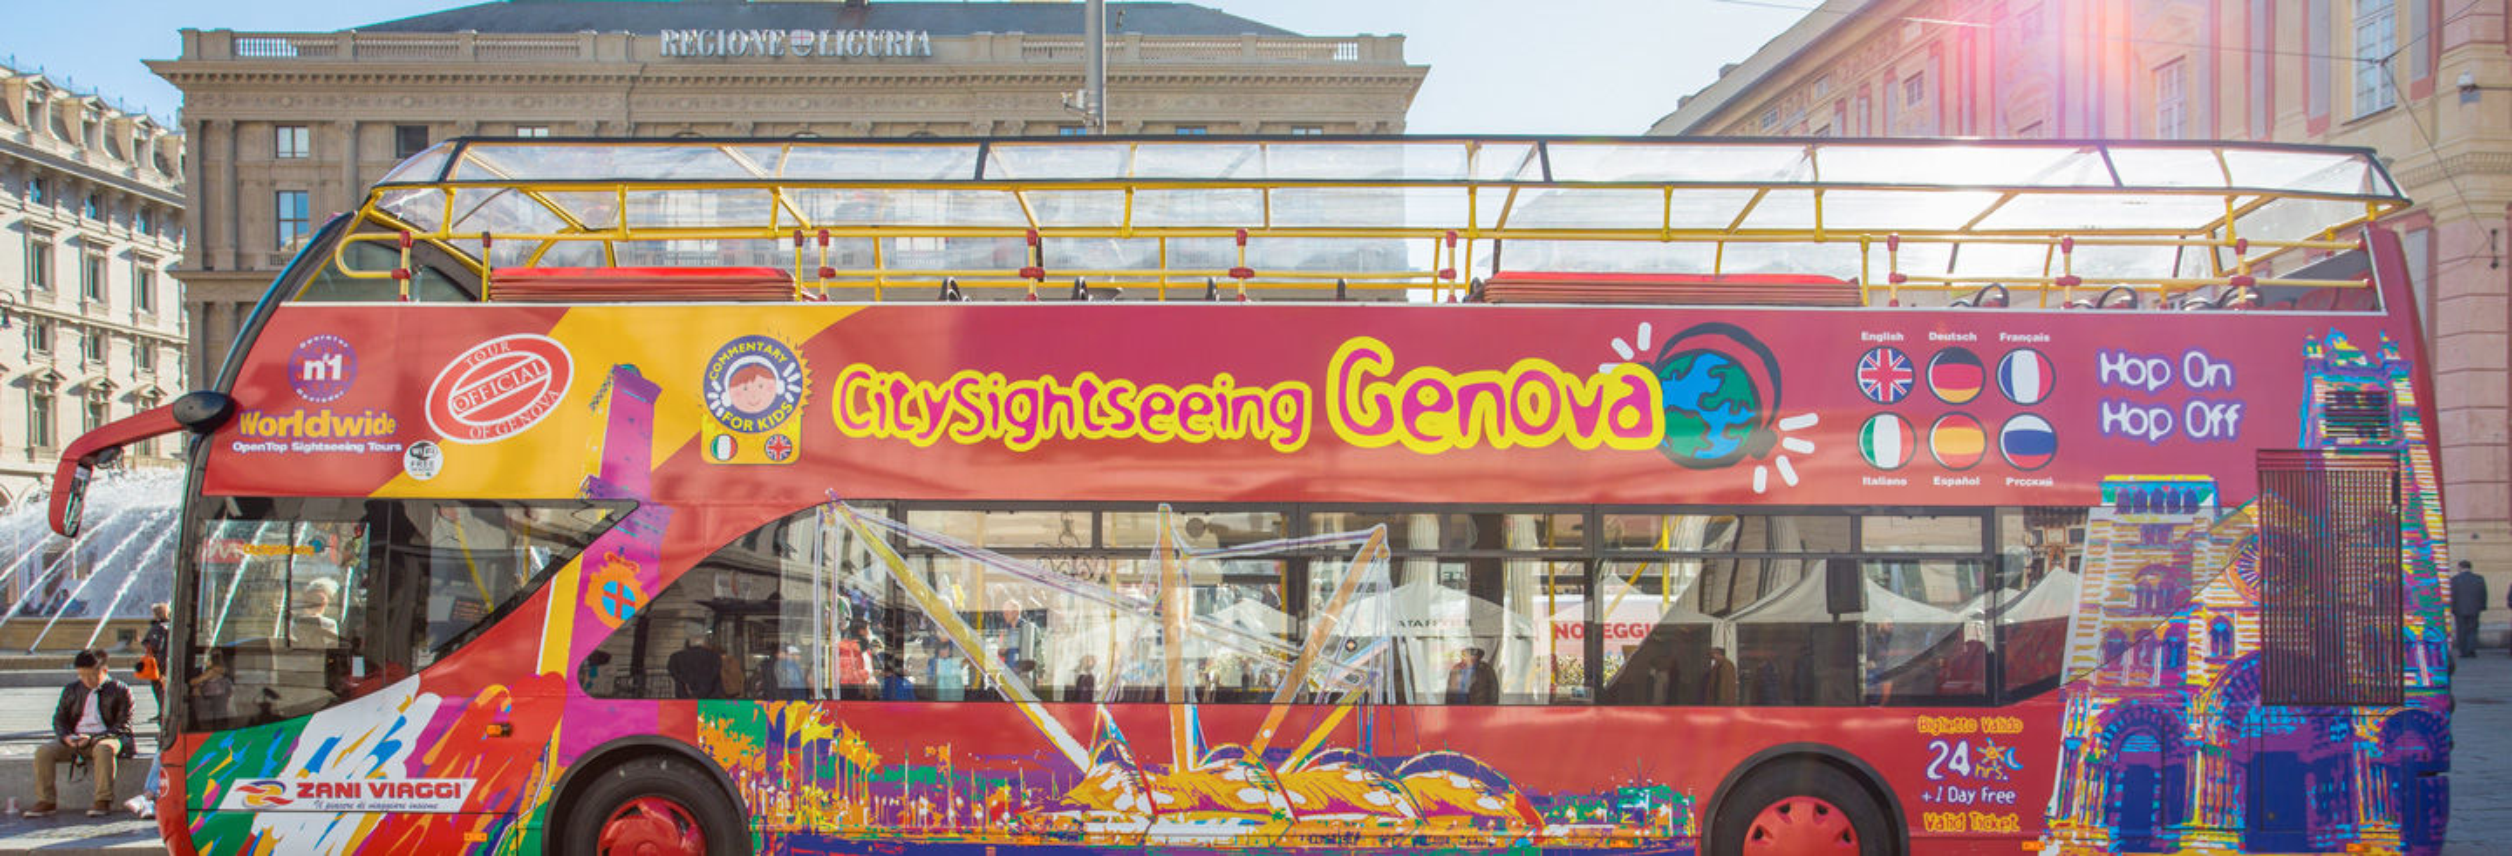 Bus touristique de Gênes